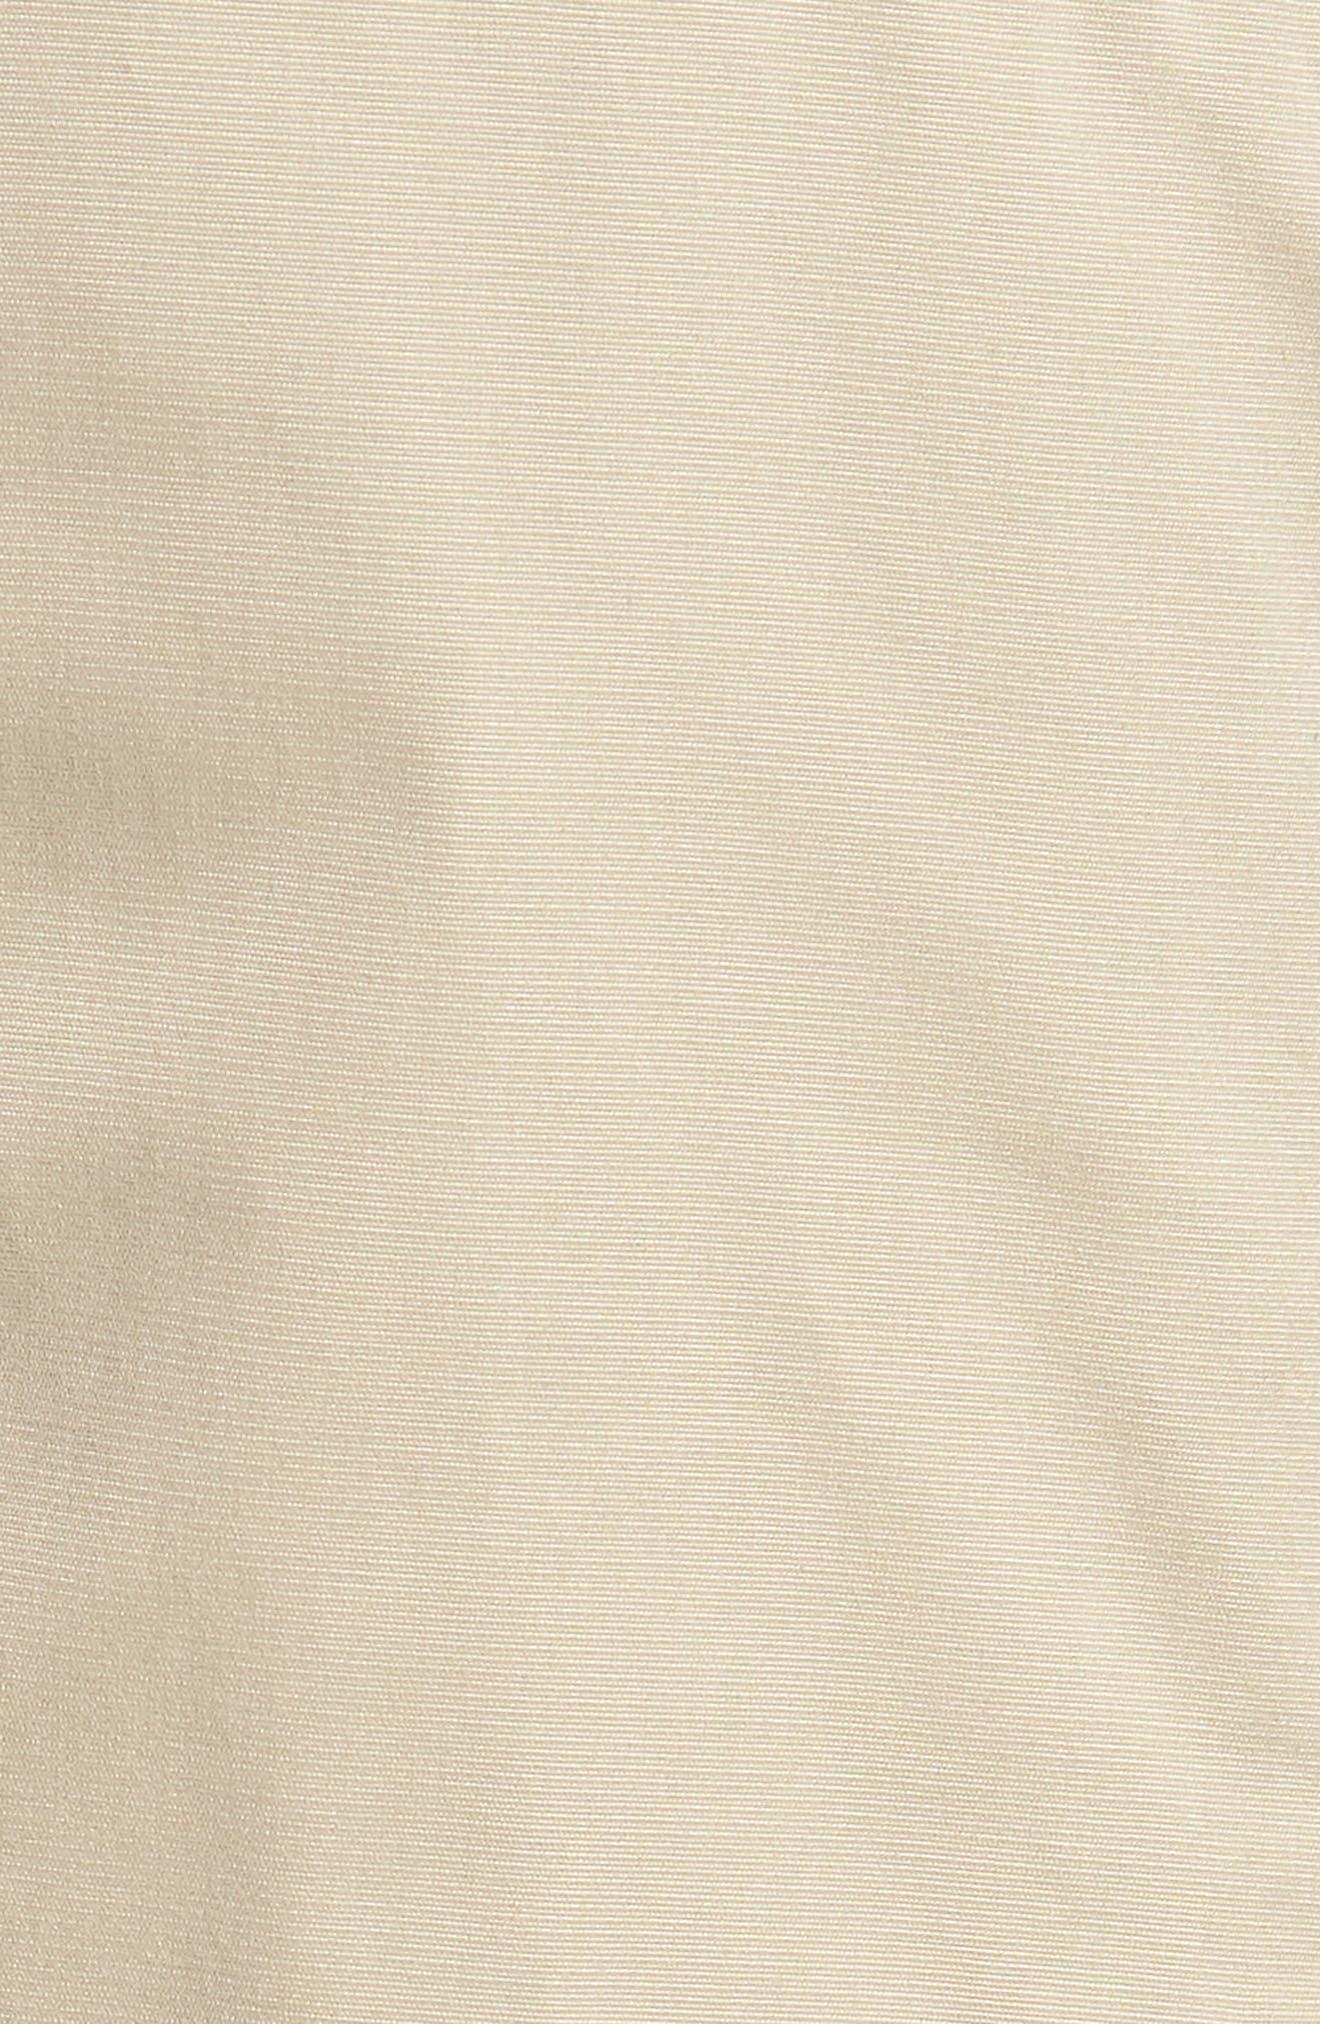 Landmark Cargo Shorts,                             Alternate thumbnail 5, color,                             Khaki